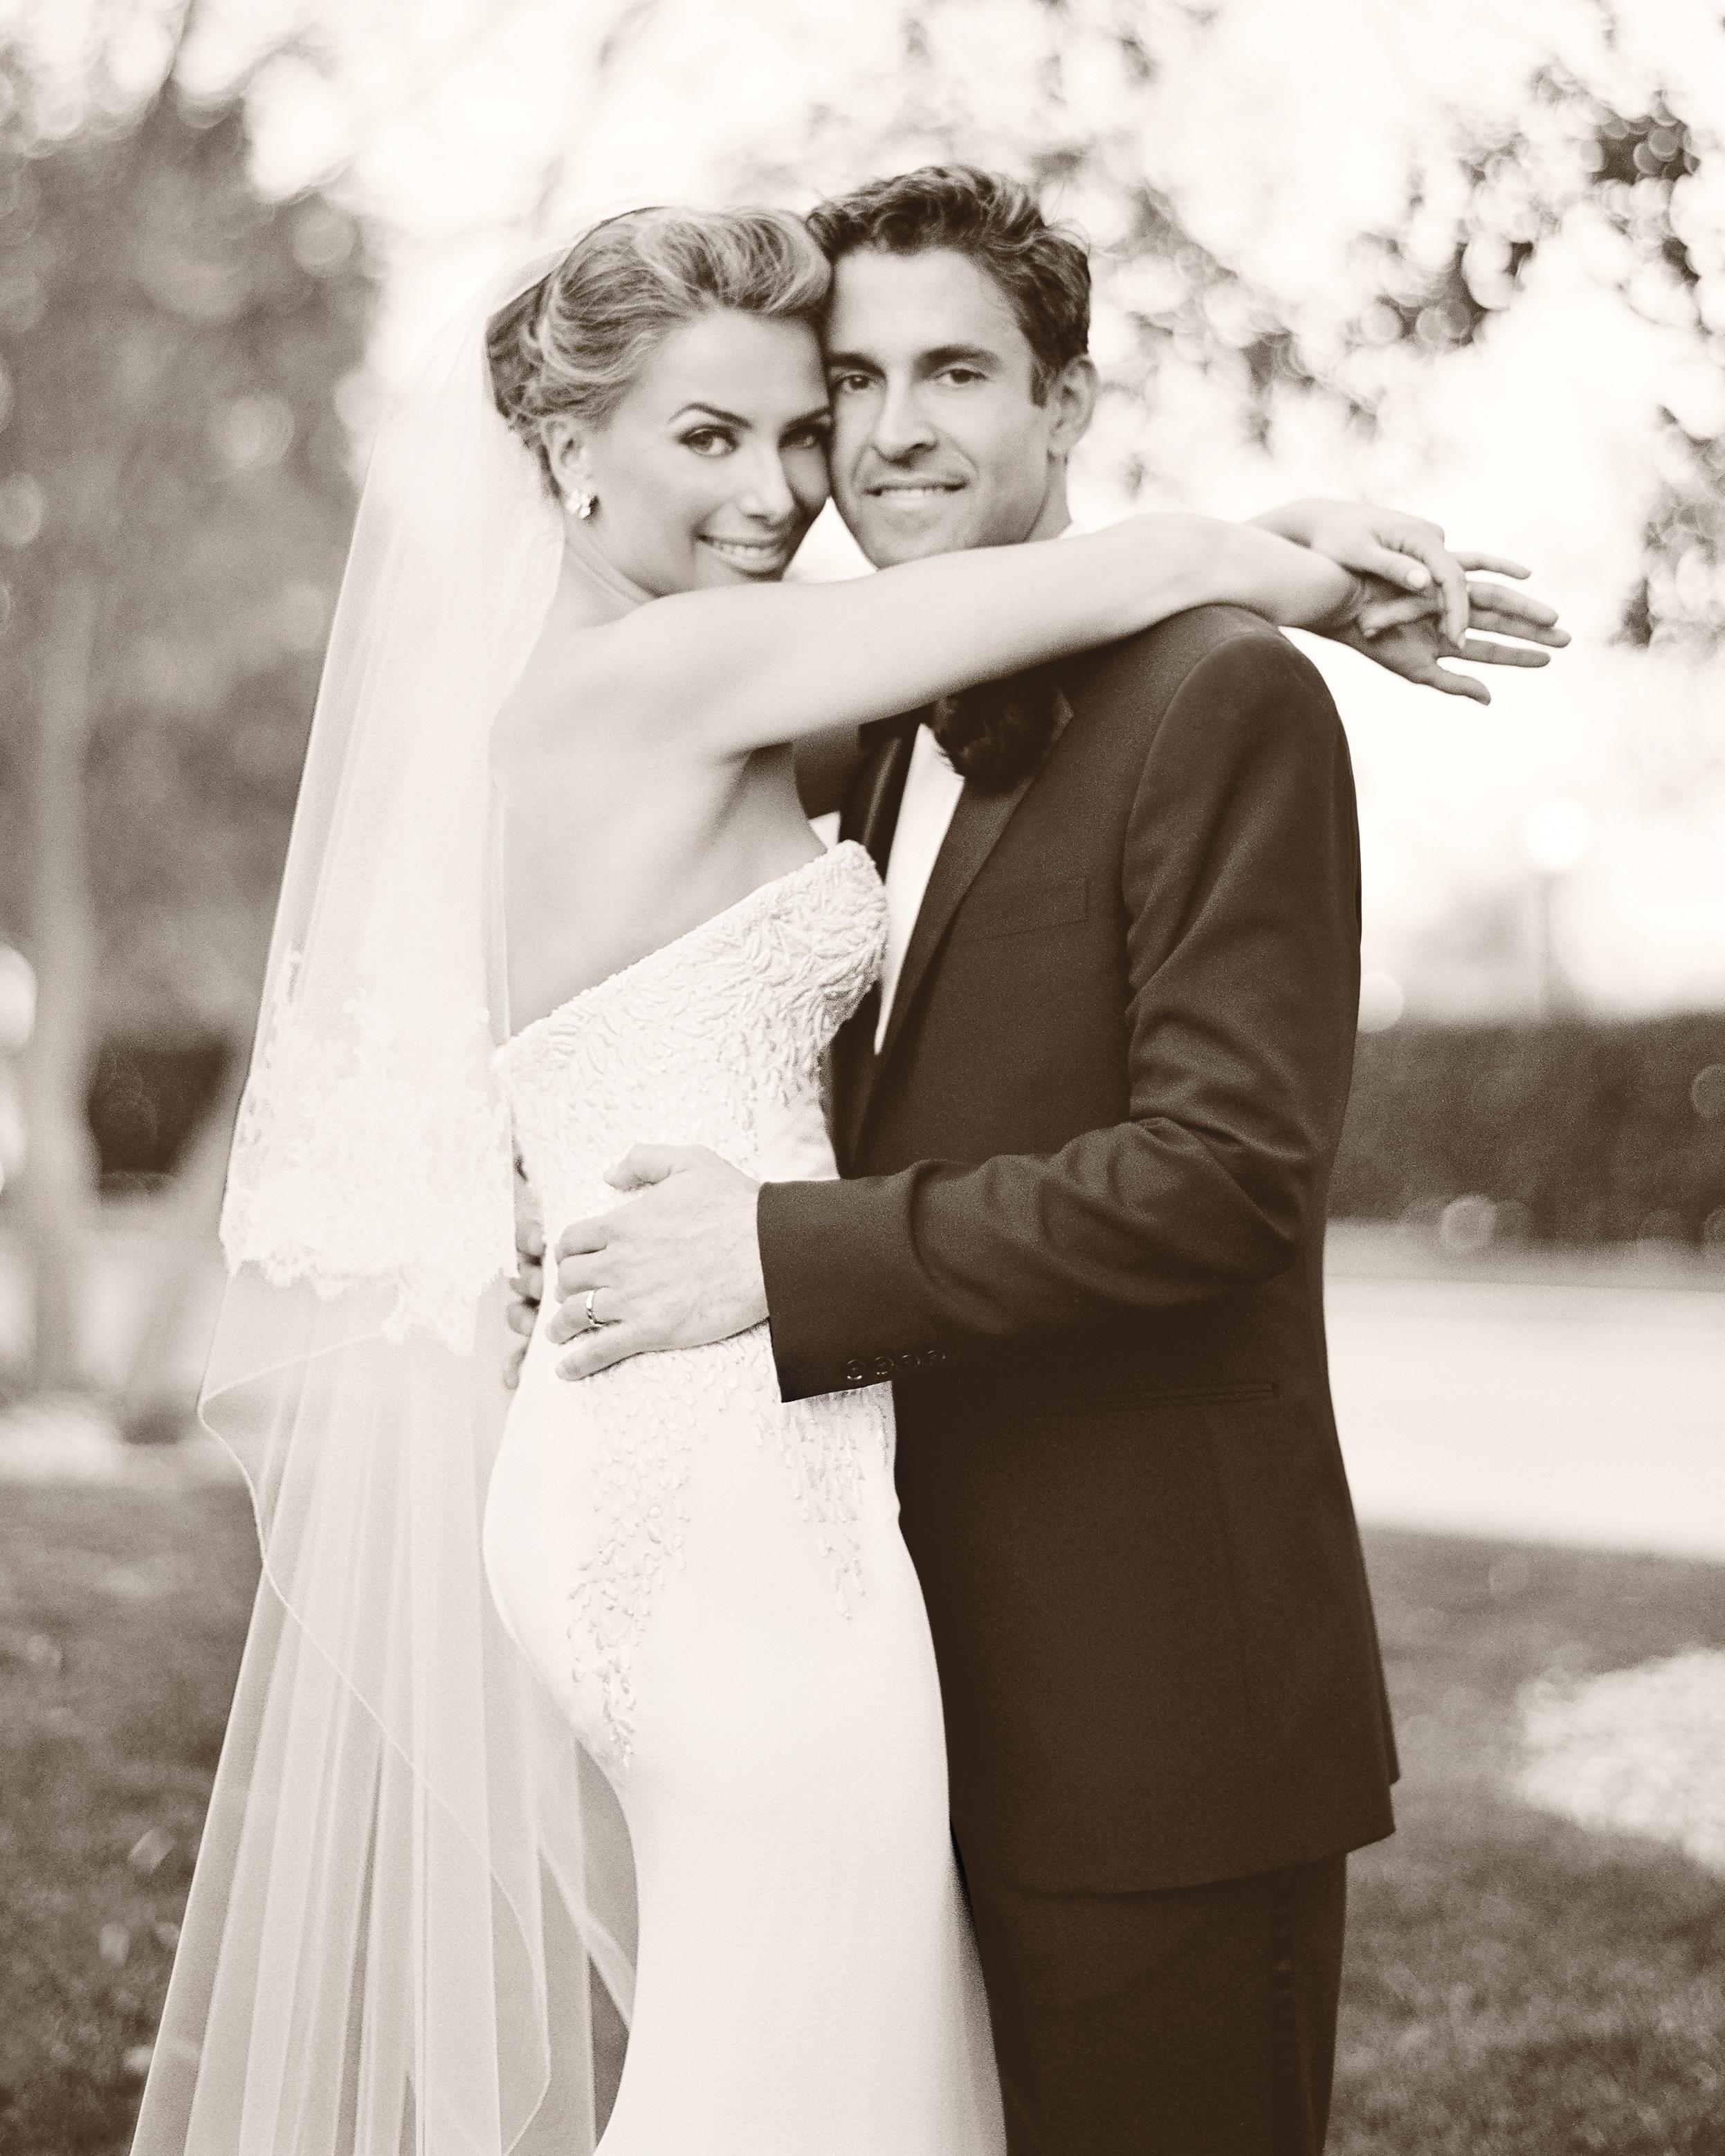 rw-jojo-eric-bride-groom-107-elizabeth-messina-ds111226.jpg